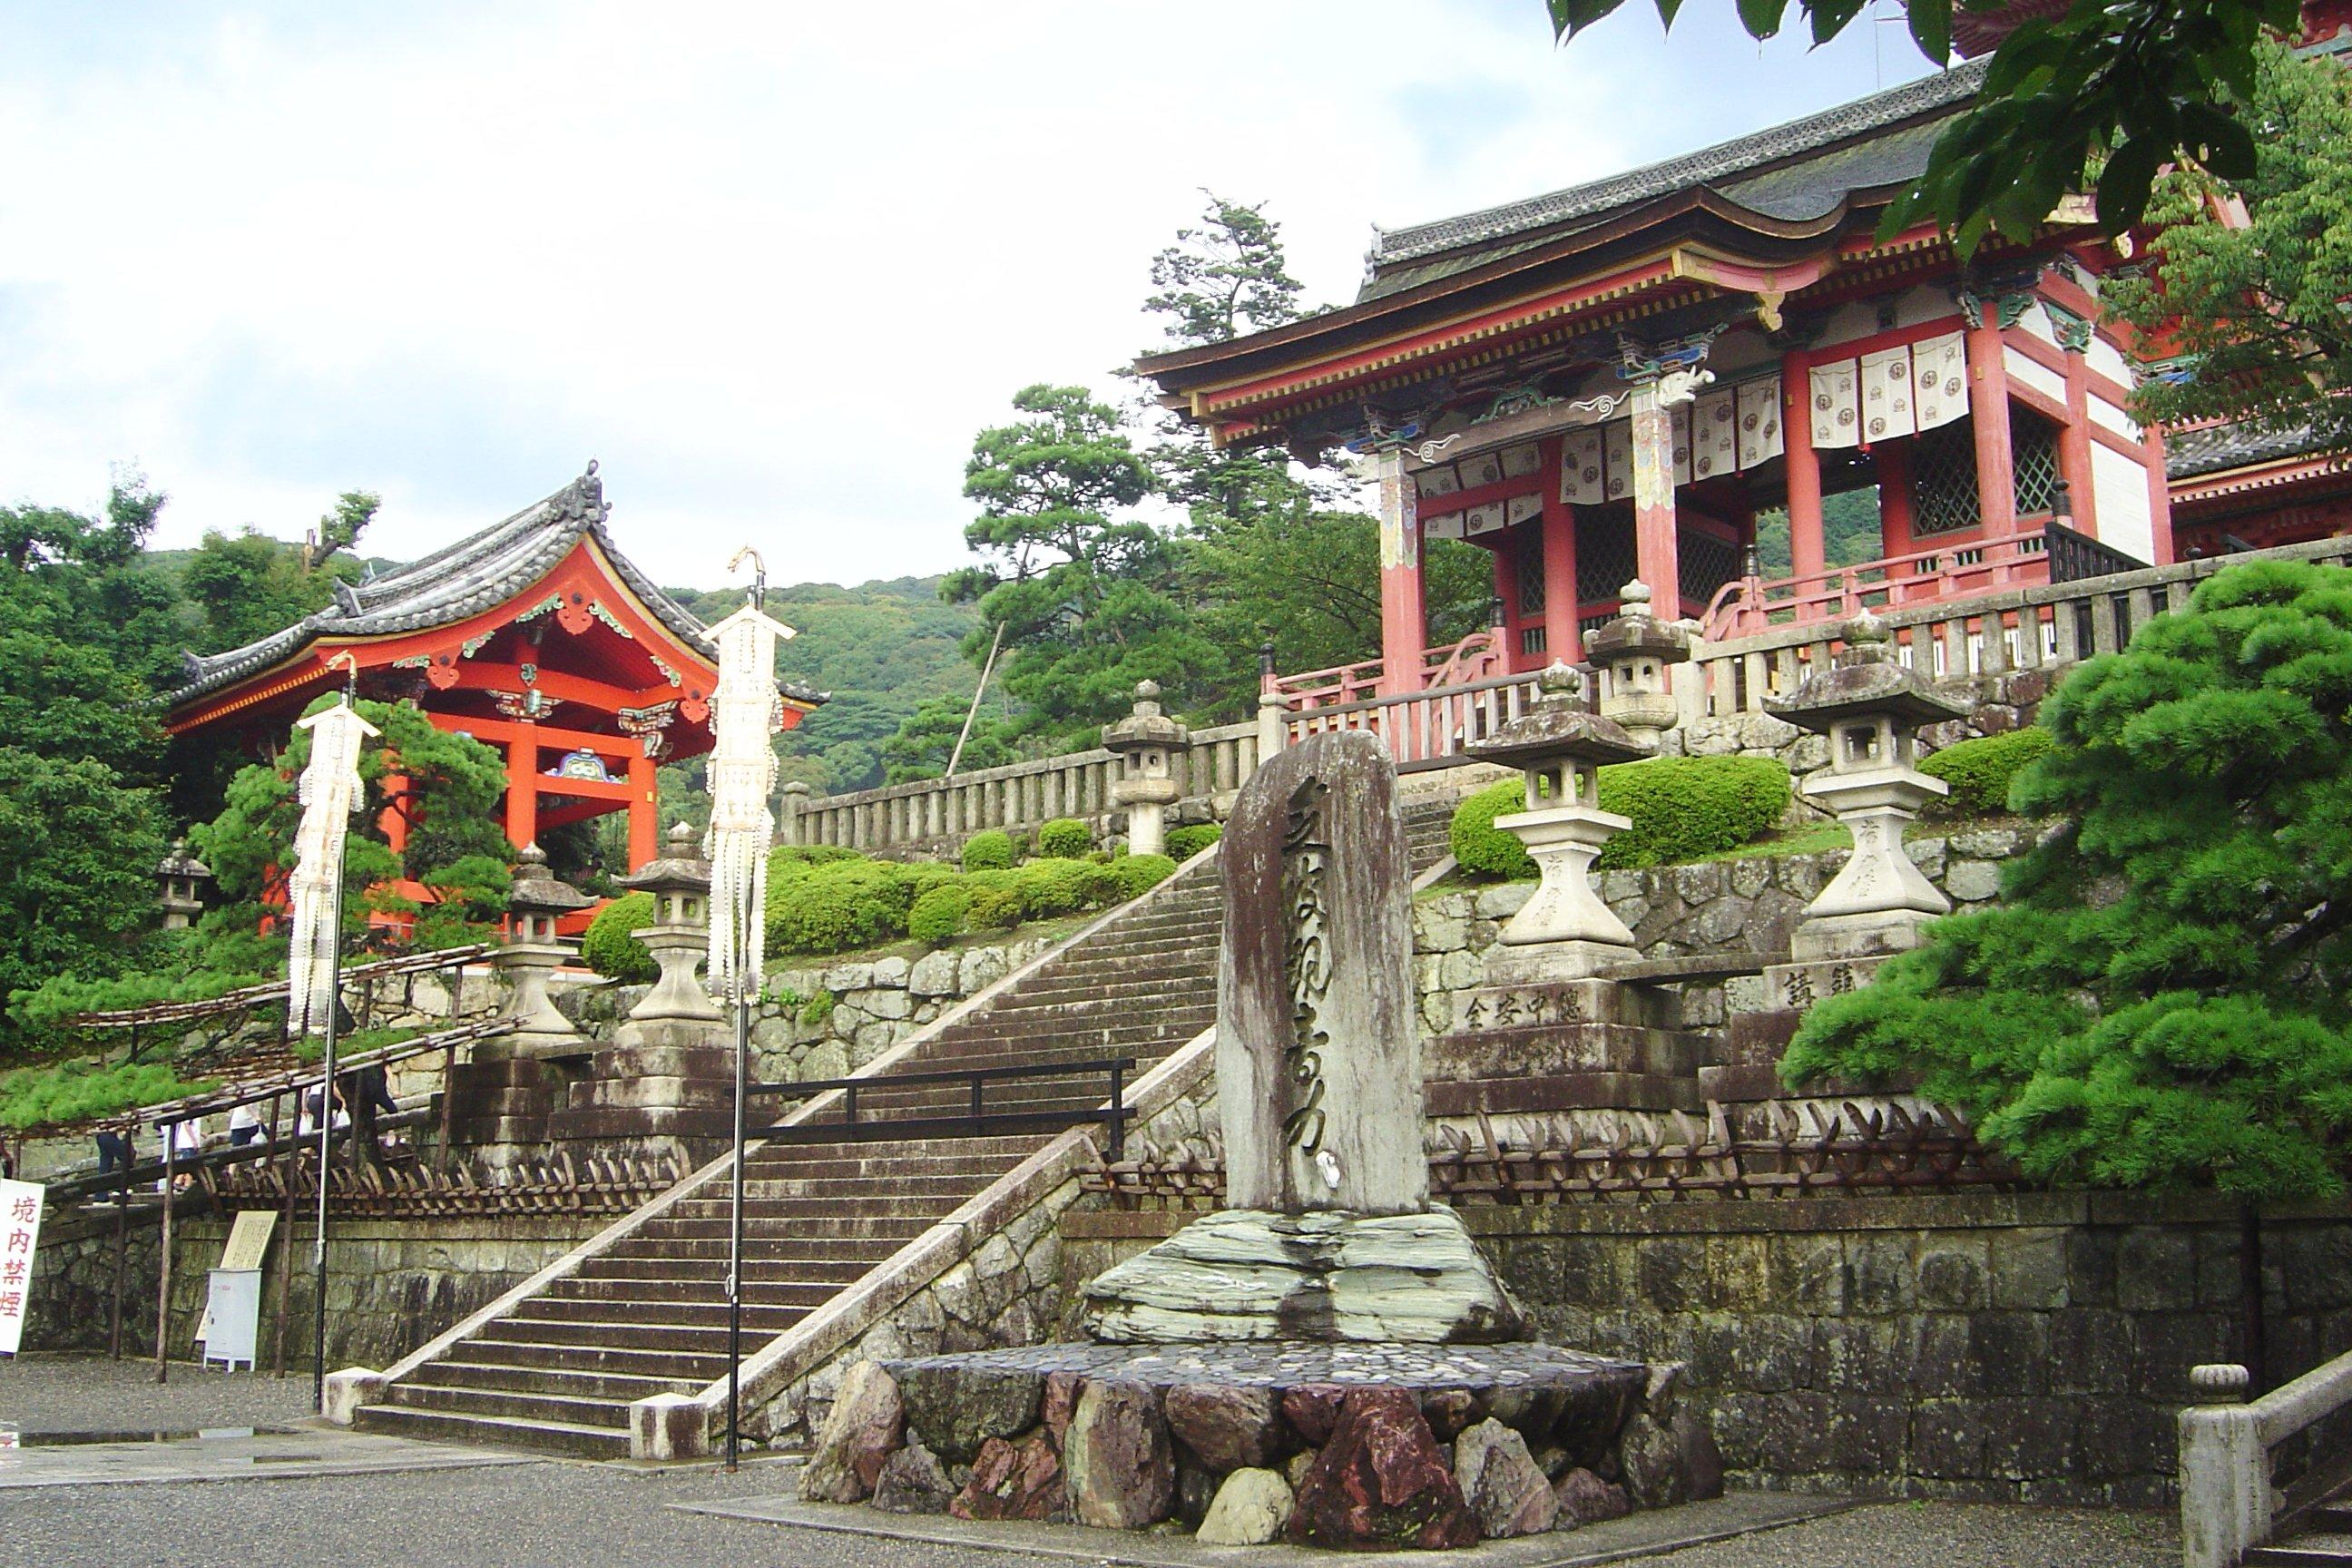 File:Japan Kyoto KiyoMizuDera entrance DSC00604.jpg